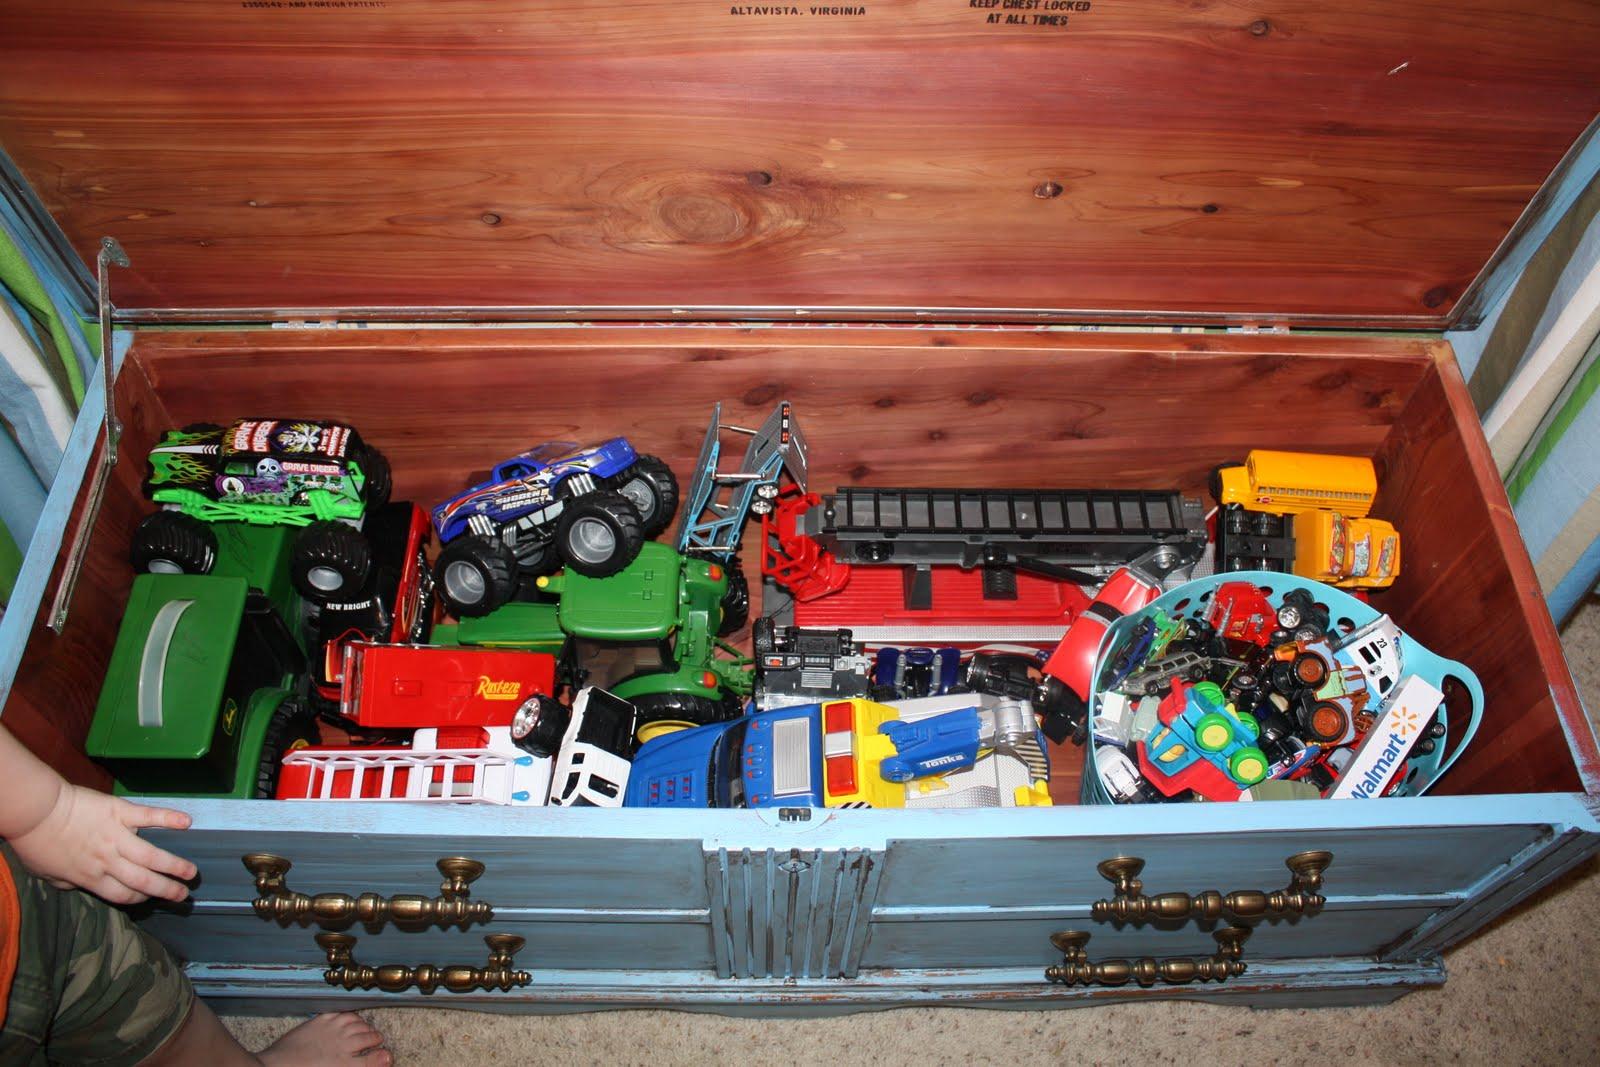 seattle craigslist cars amp trucks craigslist orange county cars. Black Bedroom Furniture Sets. Home Design Ideas